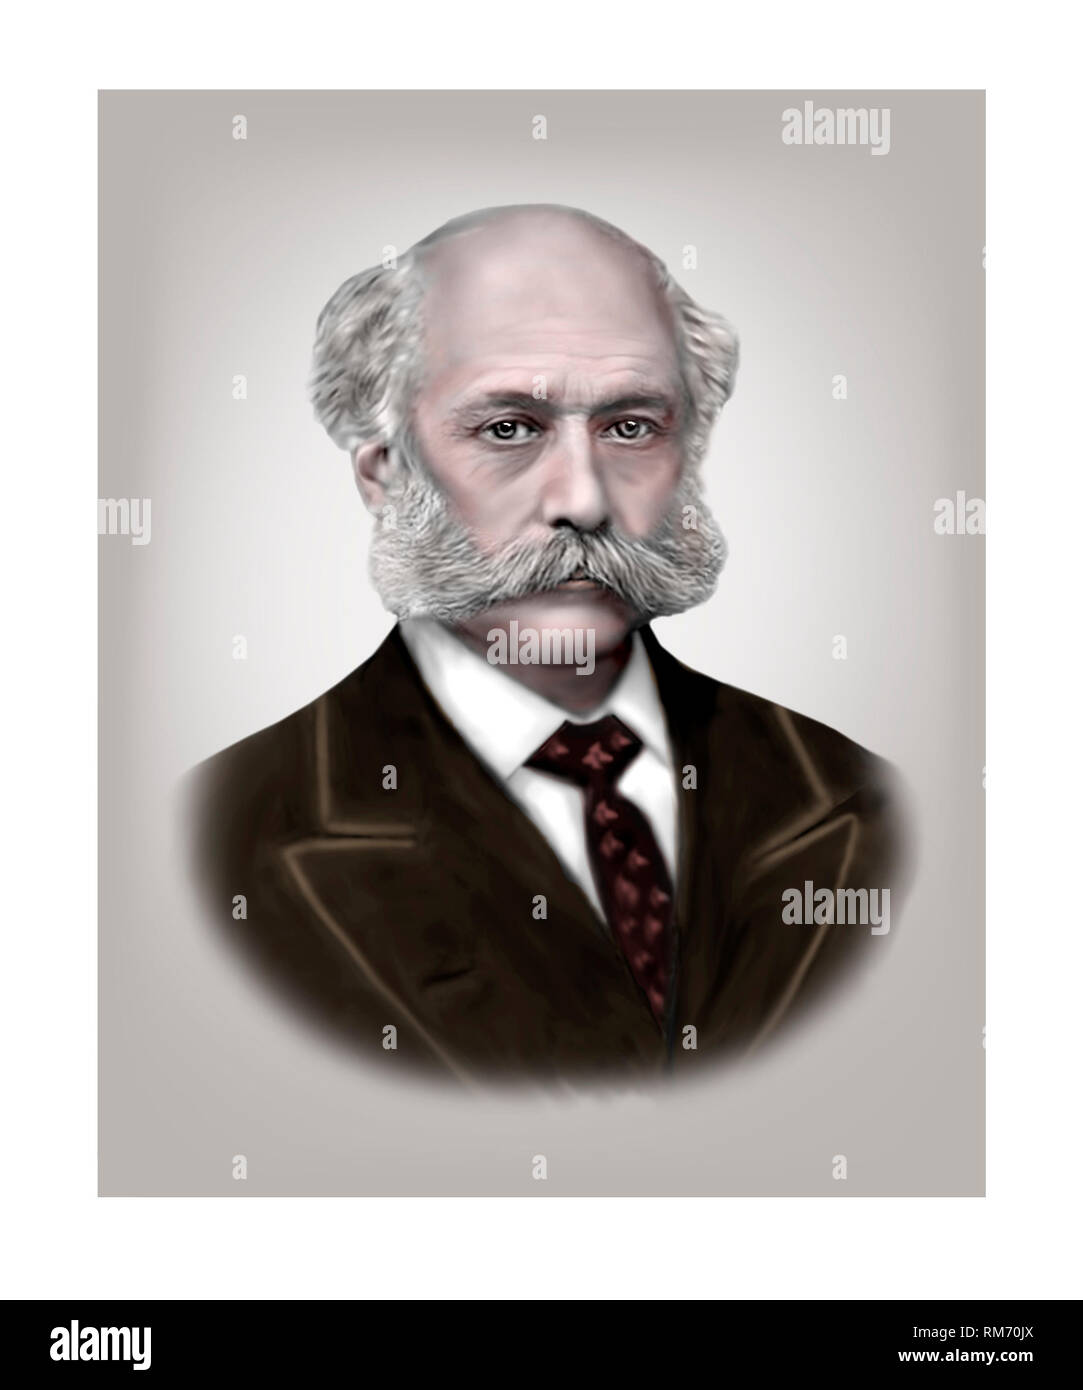 Joseph Bazalgette 1819-1891 English Civil Engineer - Stock Image